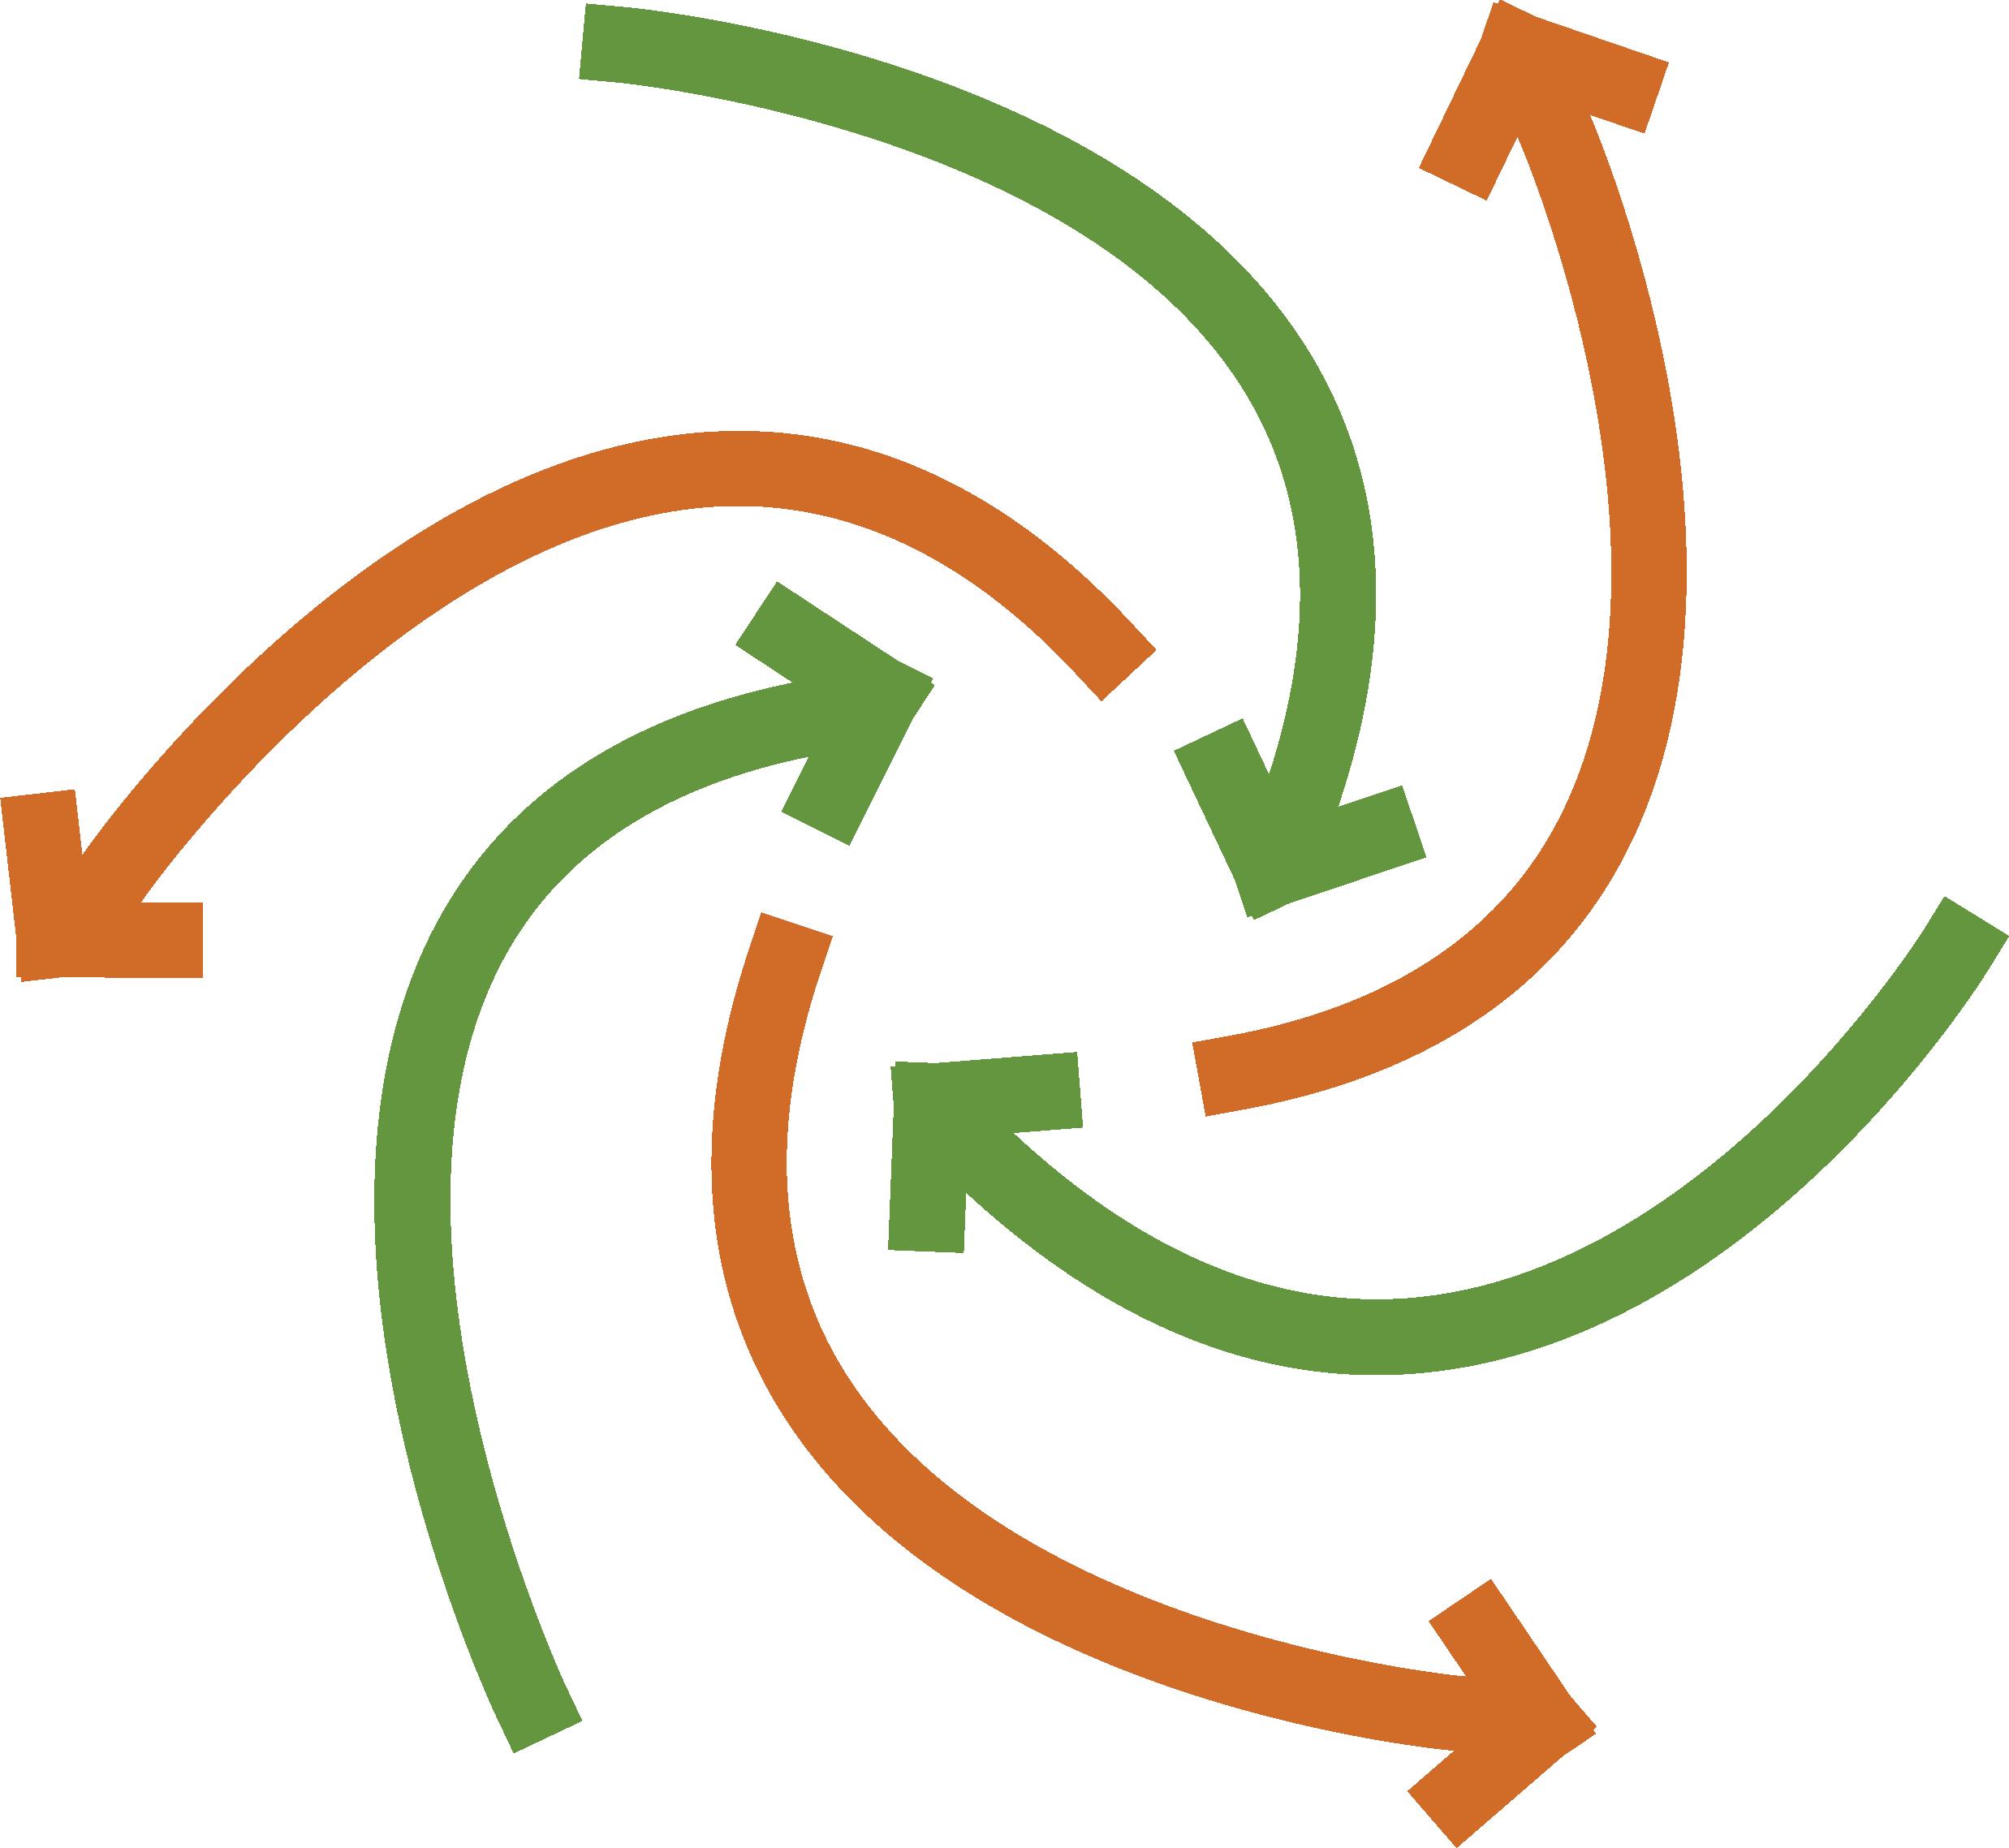 circular green and orange arrows